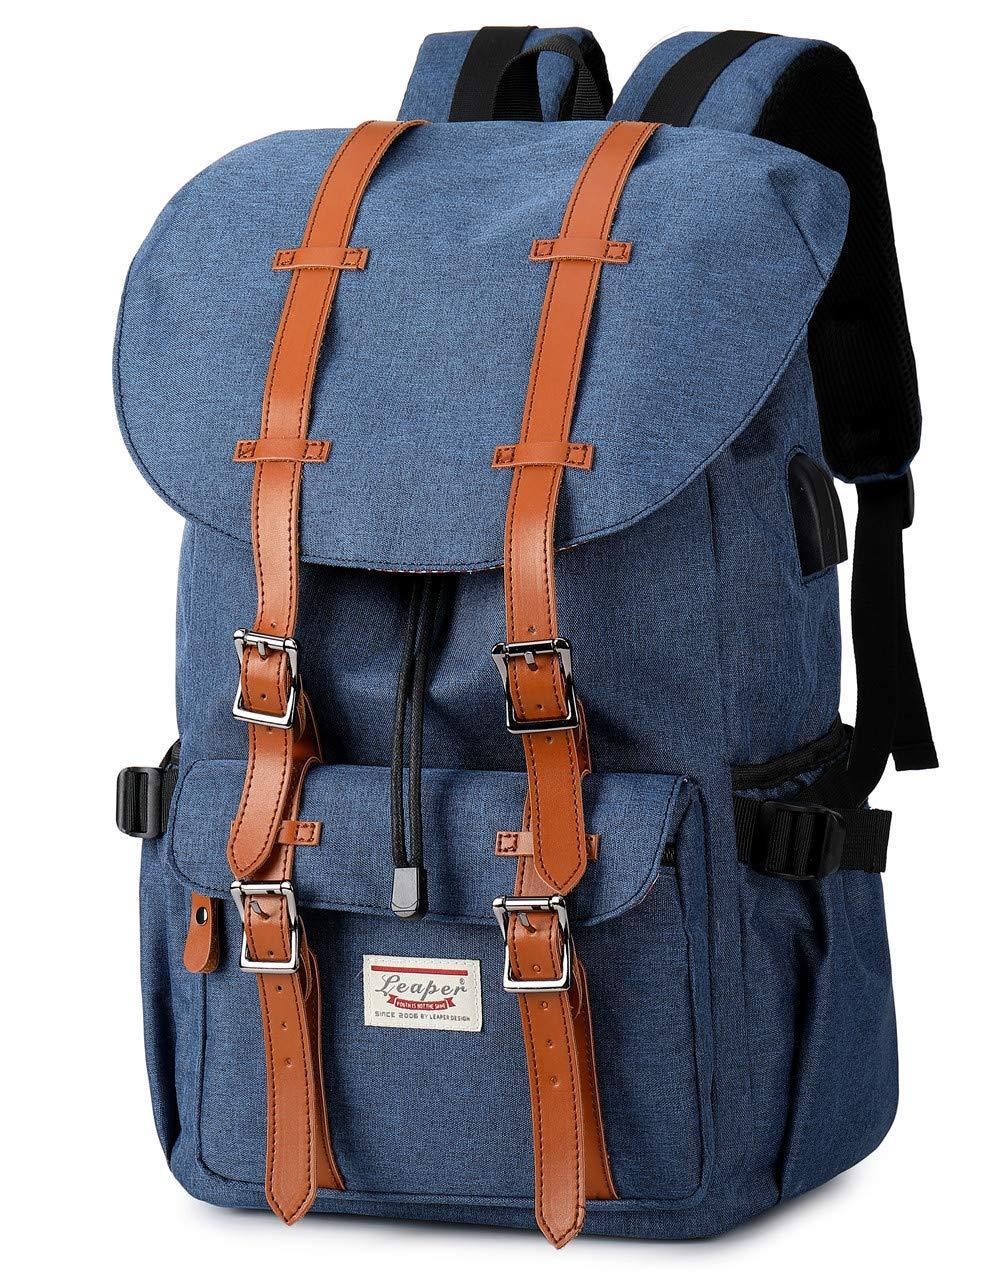 028a2713eb8 Cheap Blue Bookbag, find Blue Bookbag deals on line at Alibaba.com